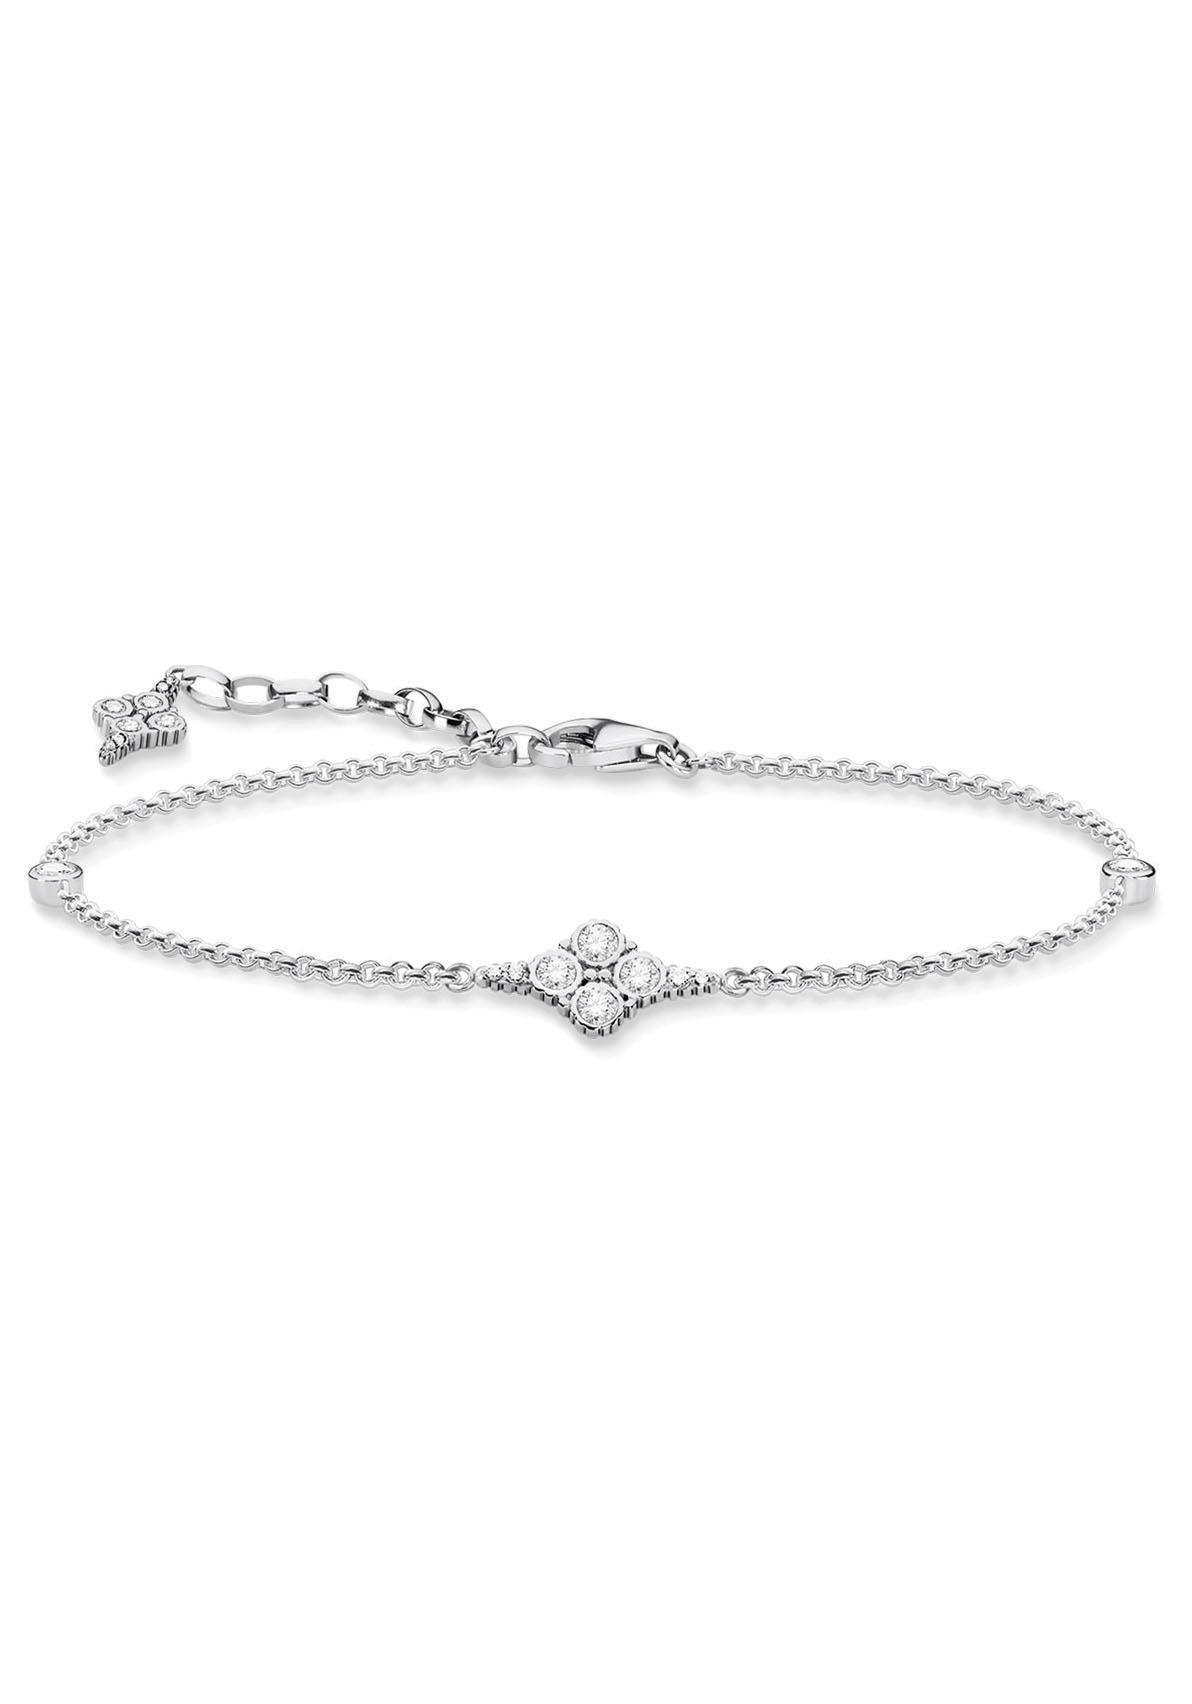 THOMAS SABO Silberarmband »A1824-643-14-L19v, Royalty weiß« mit Zirkonia